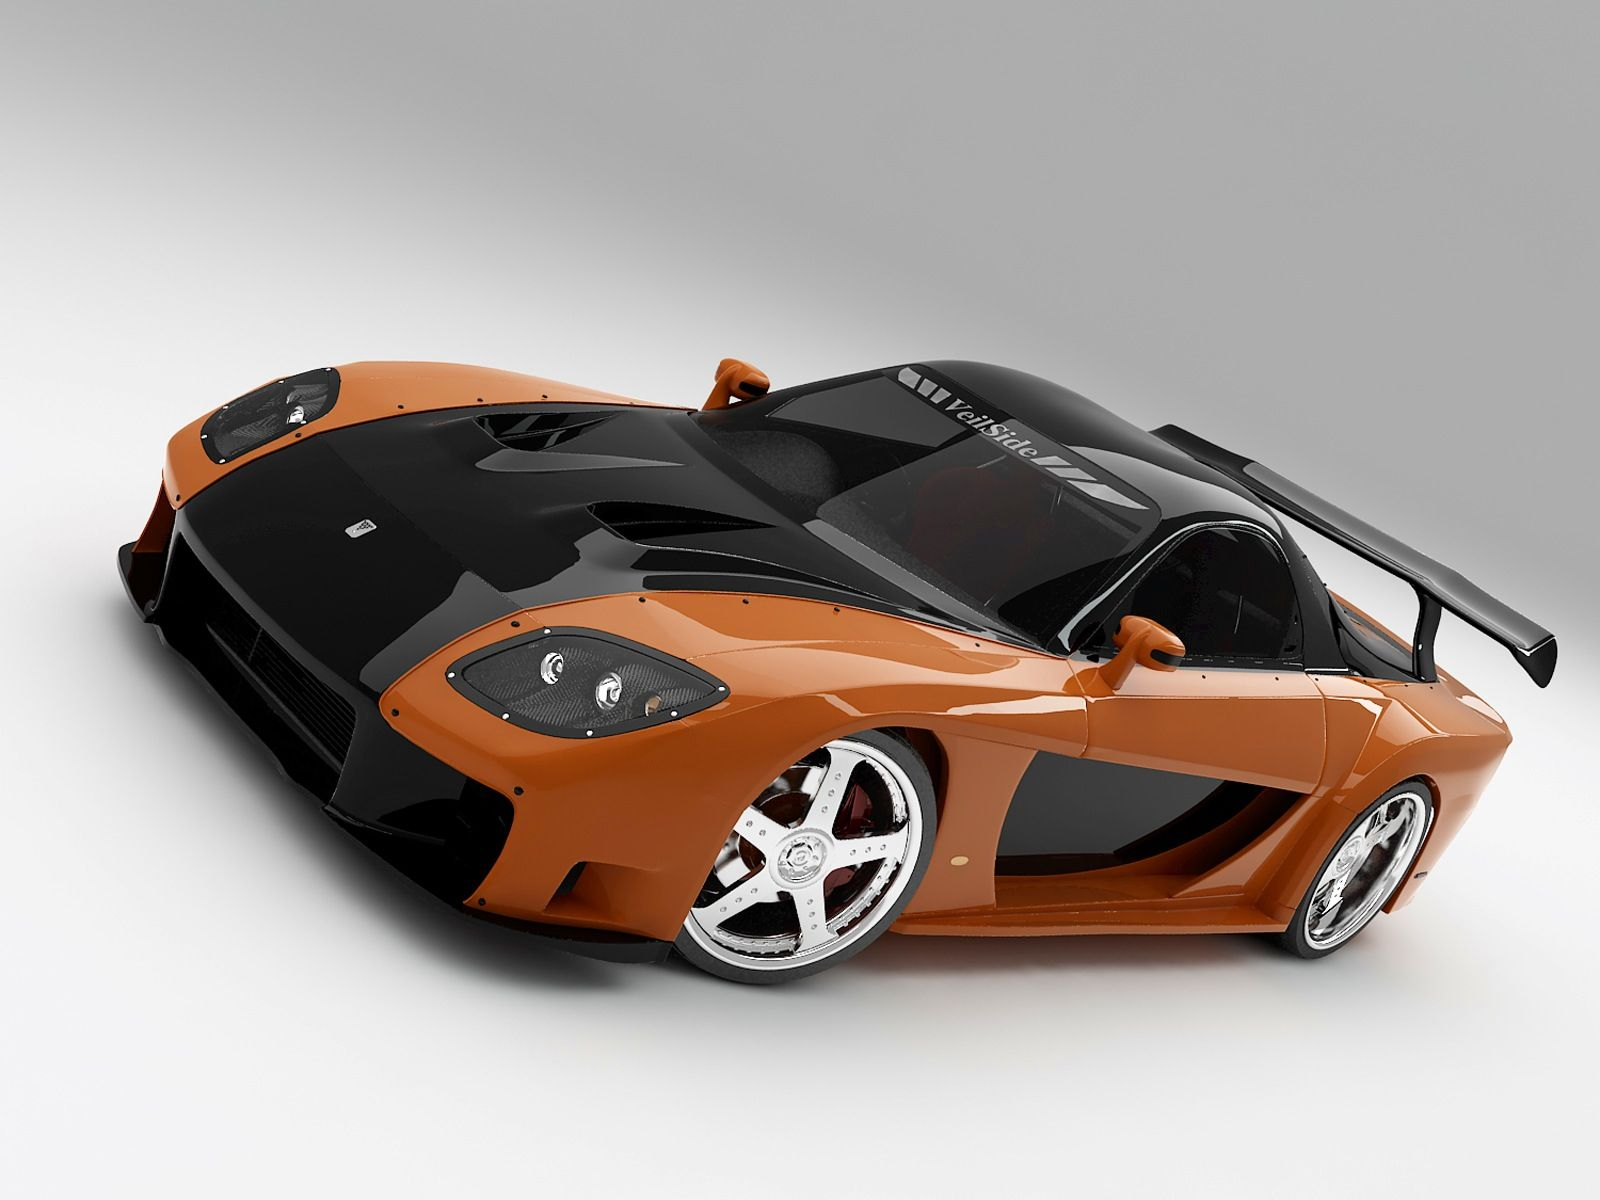 31 best mazda rx-7 veilside images on pinterest | import cars, rx7